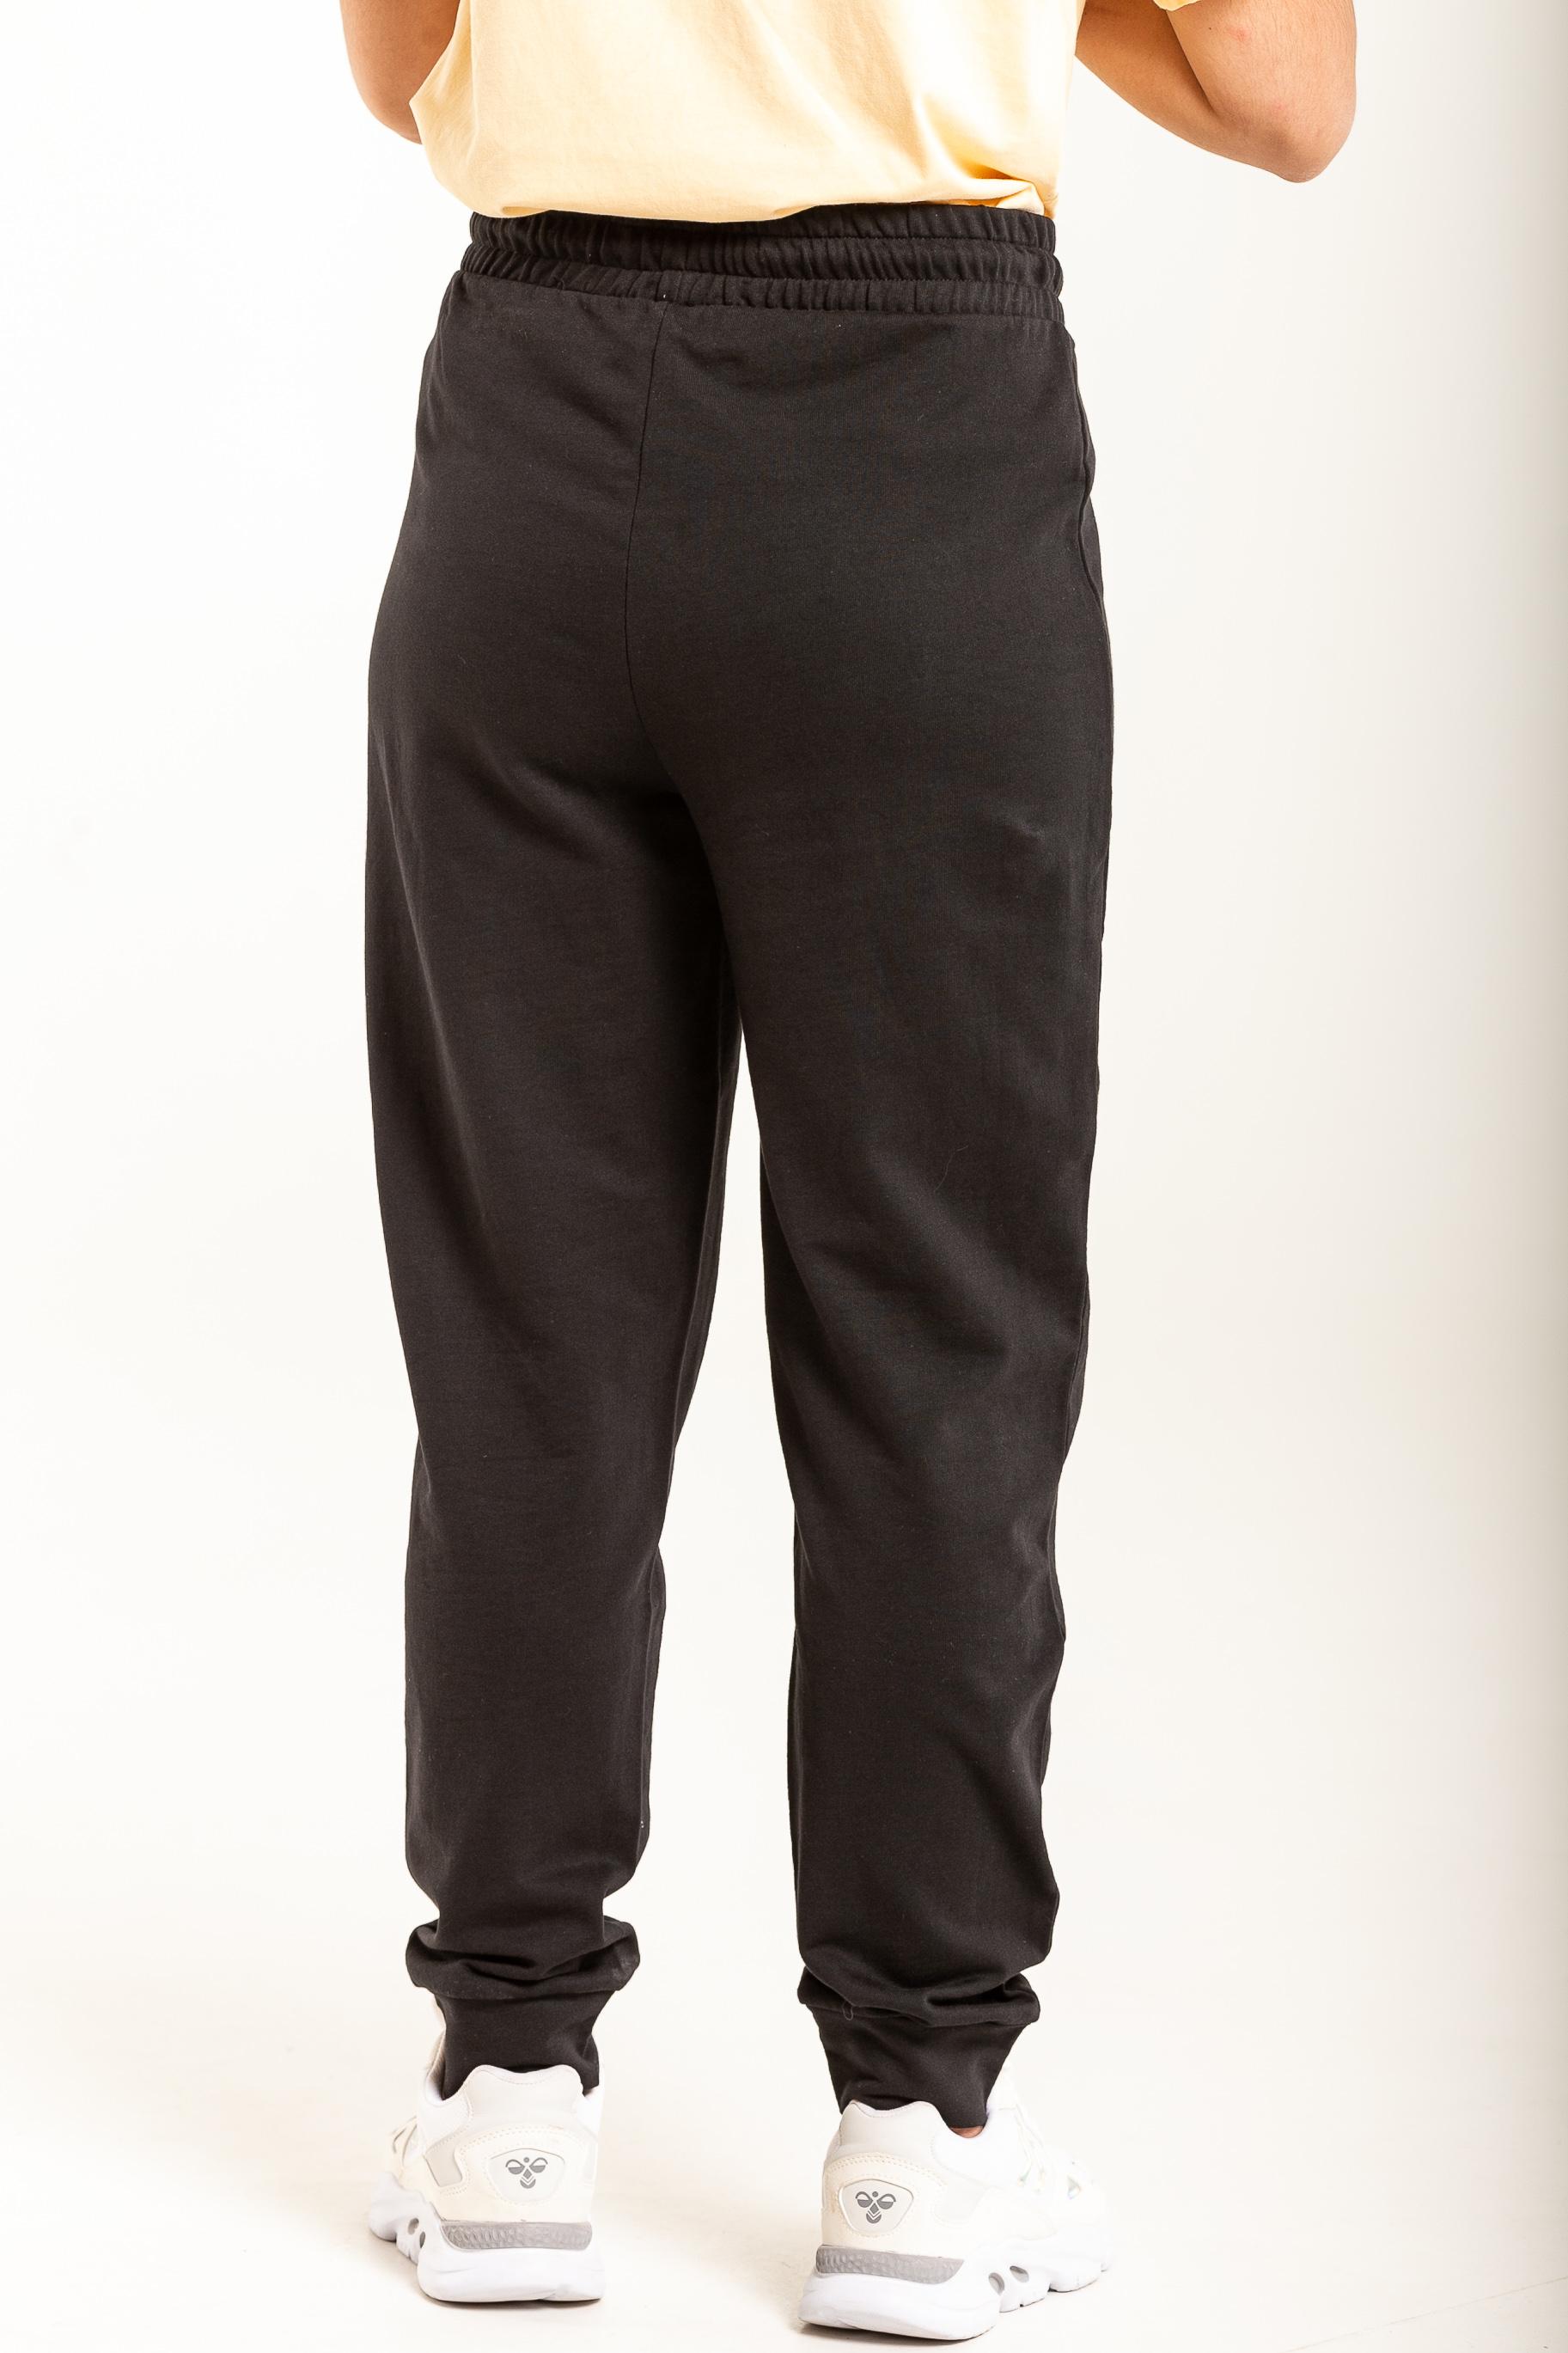 Pantaloni ONLY Casual (3307) photo 0